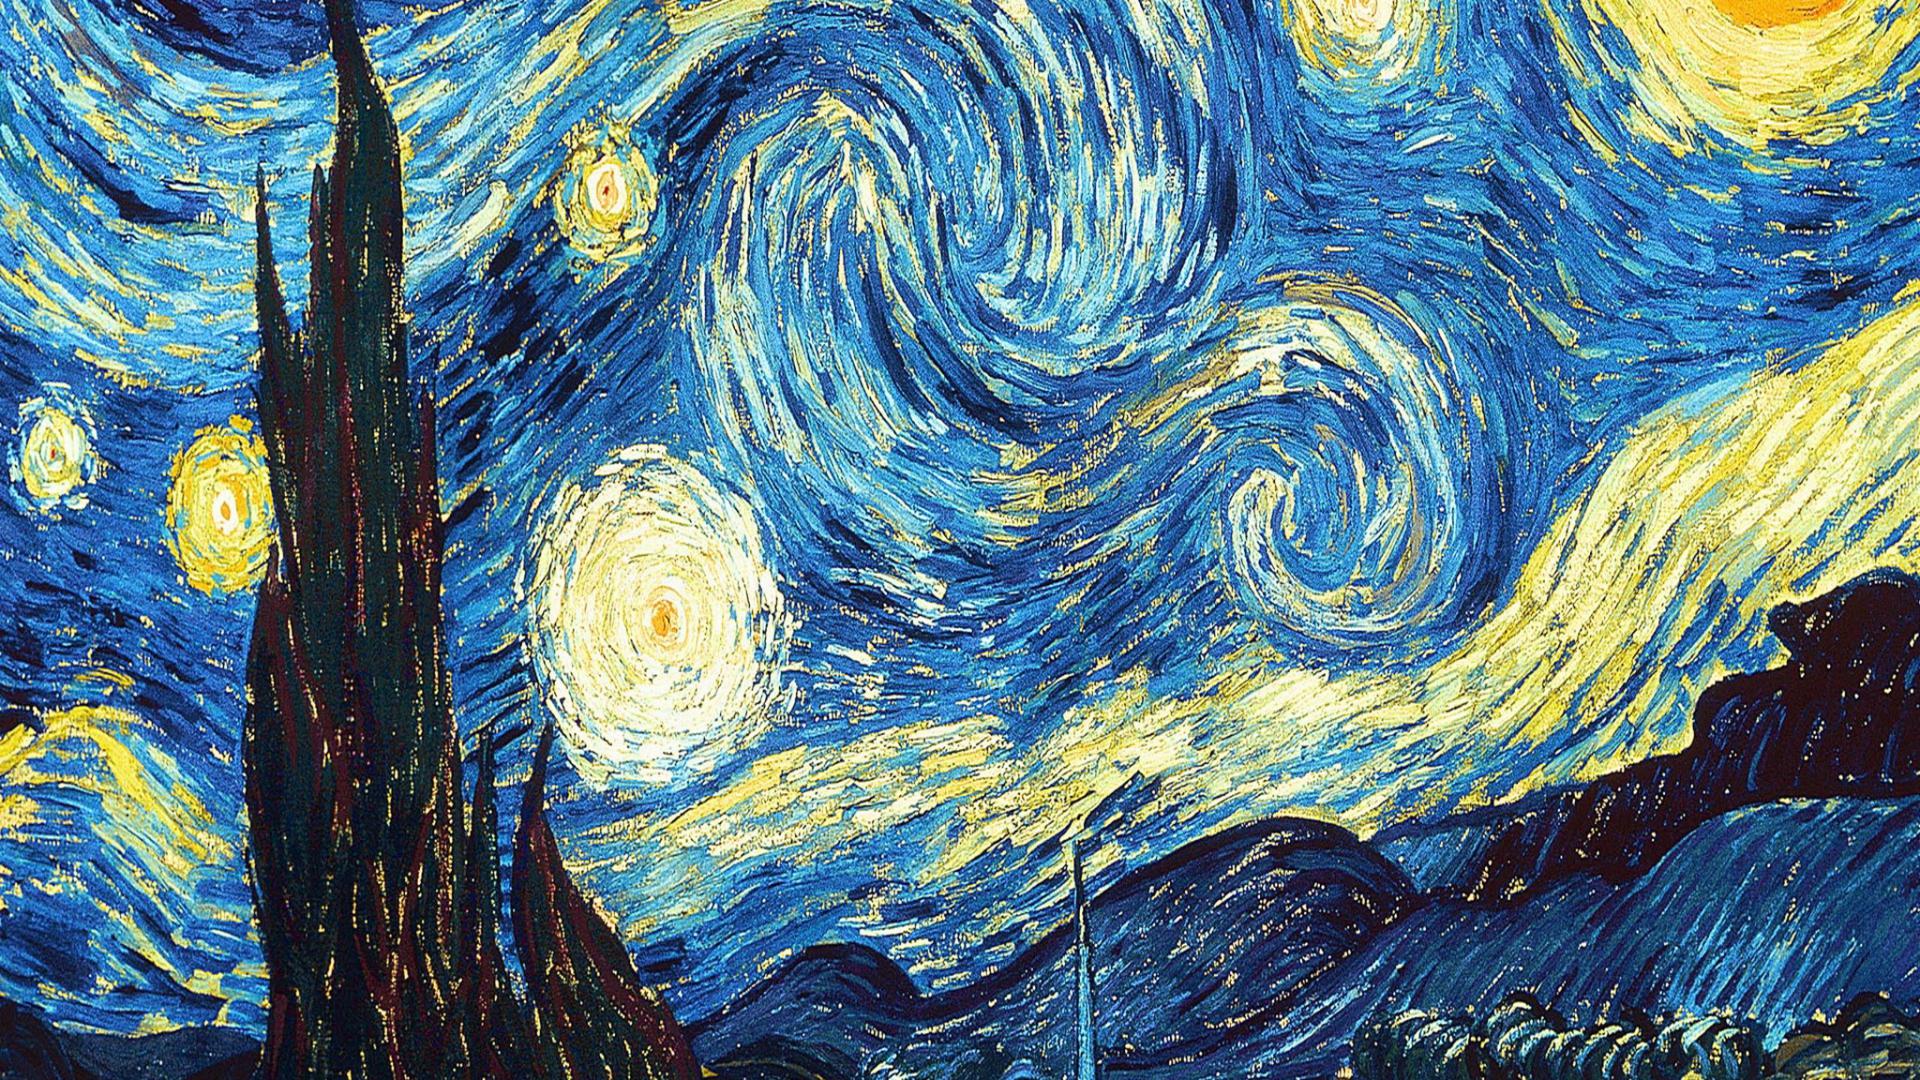 Free Download Vincent Van Gogh Starry Night Ipad 3 Wallpaper New